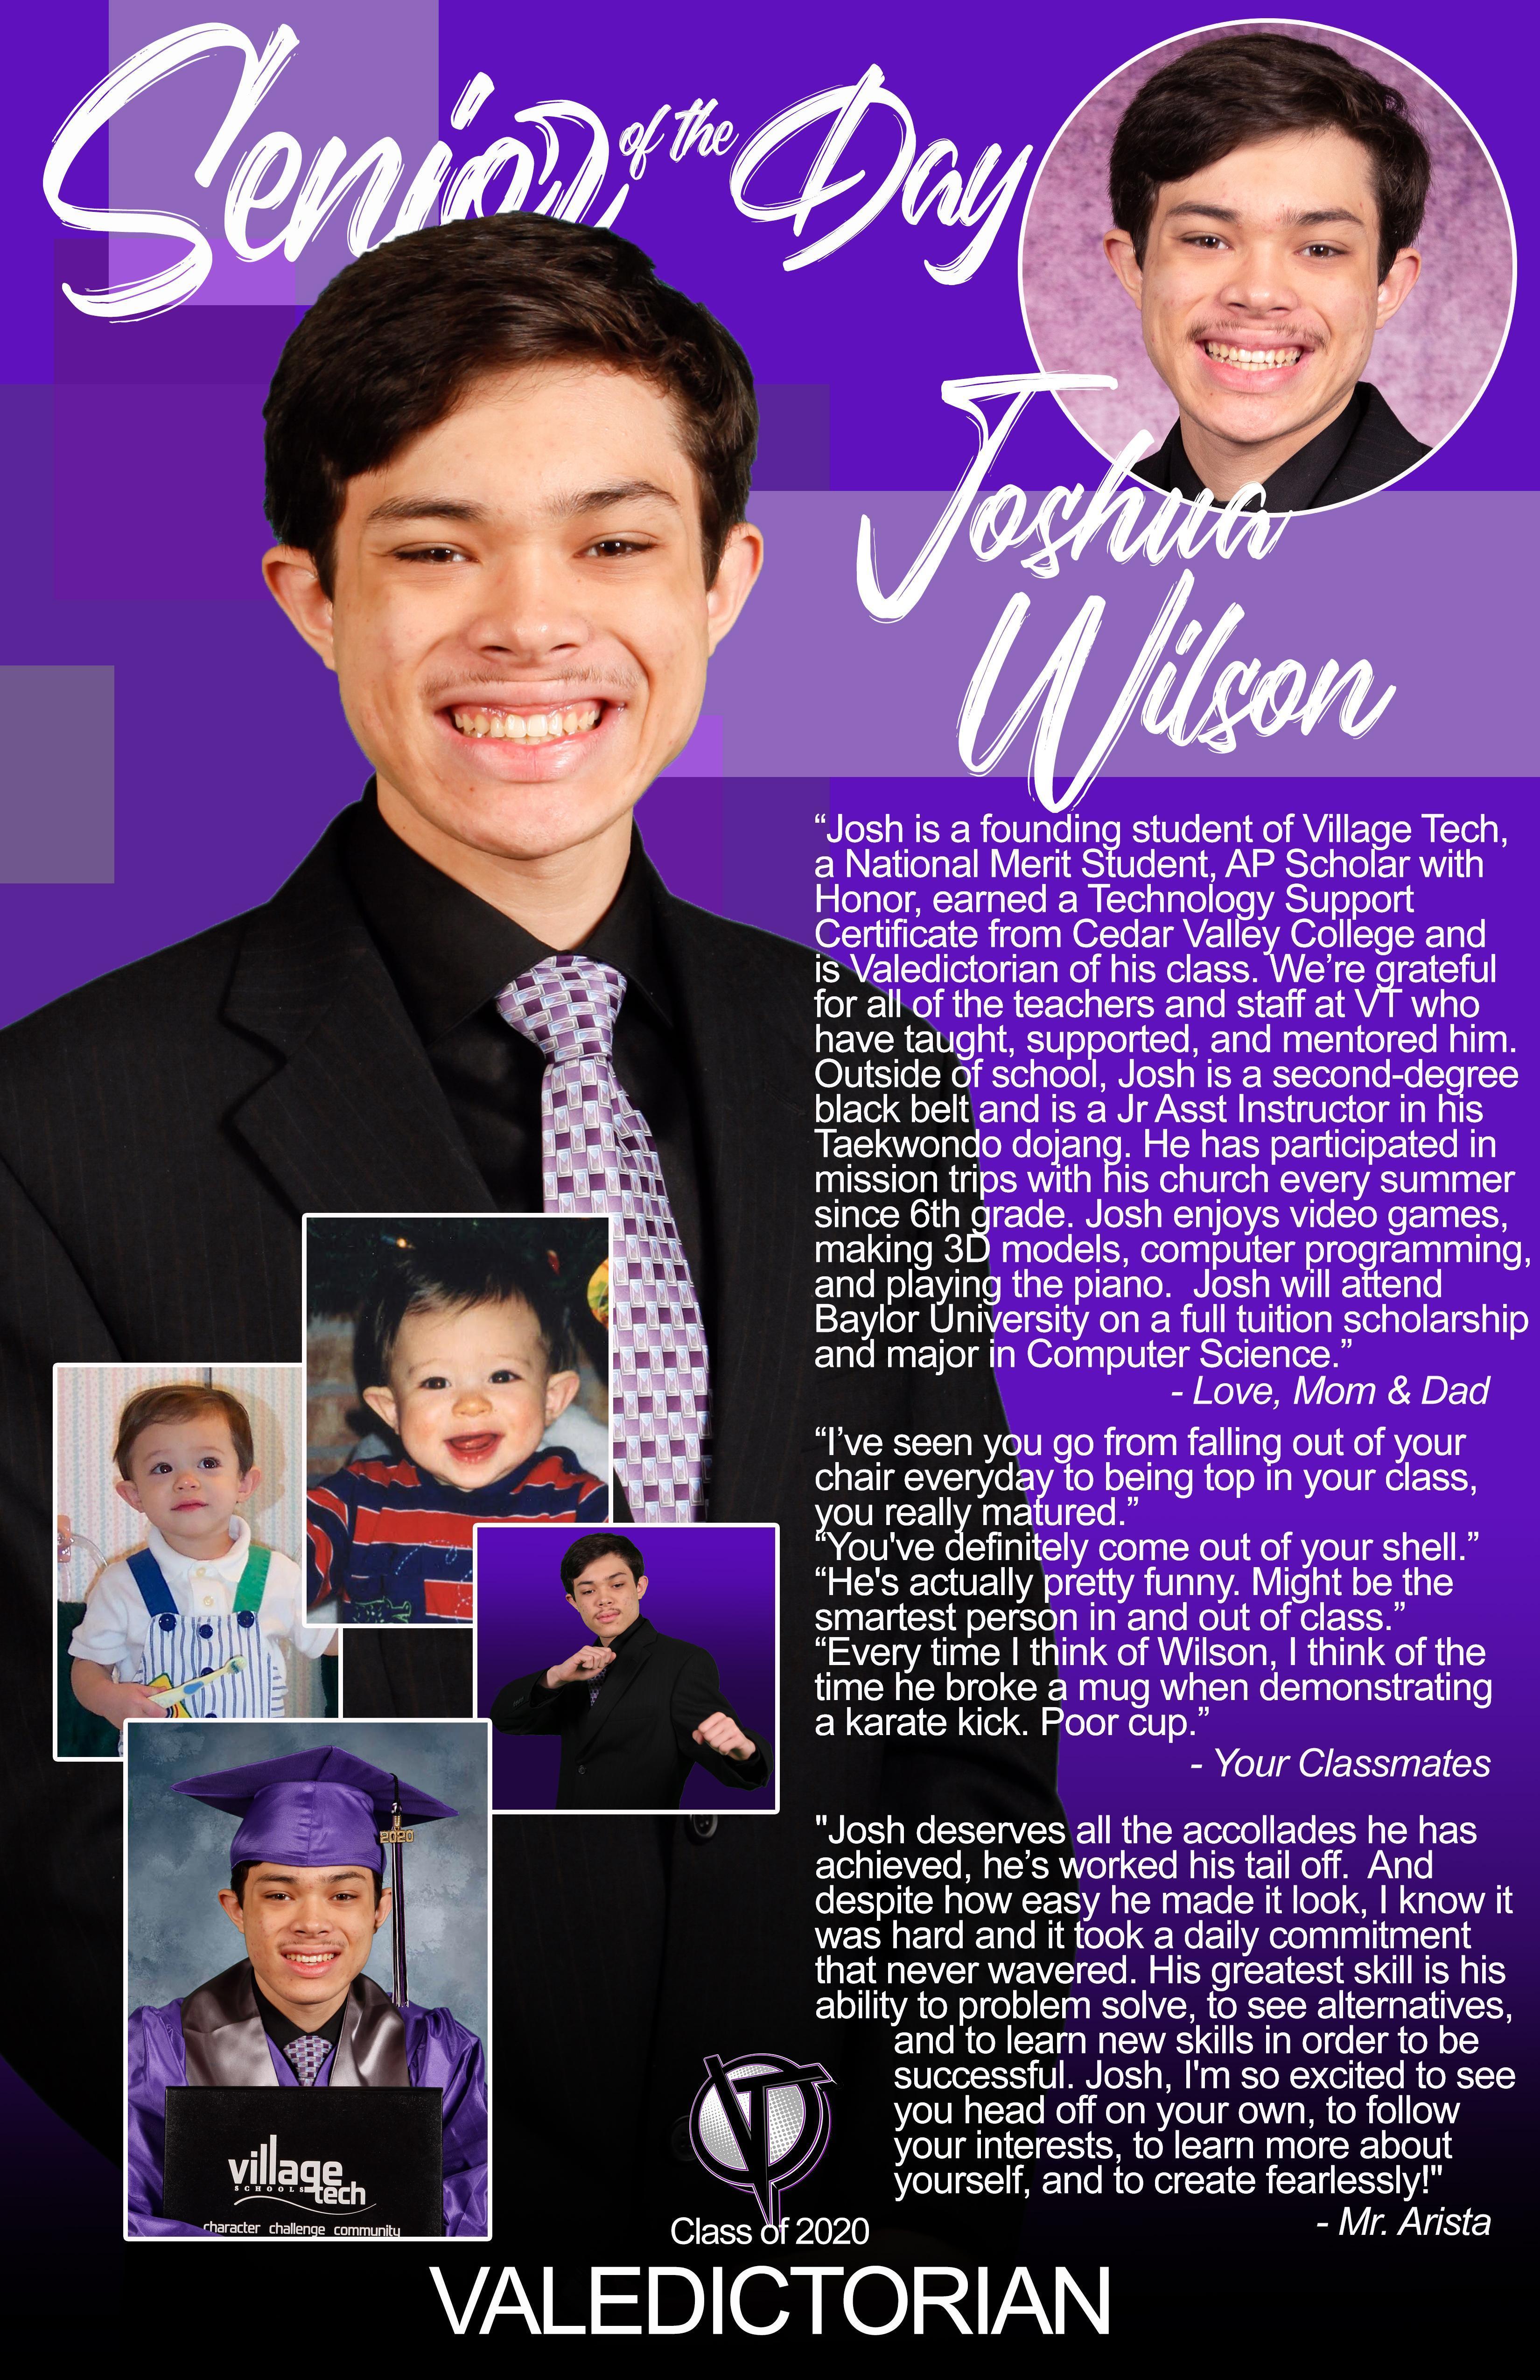 Joshua Wilson